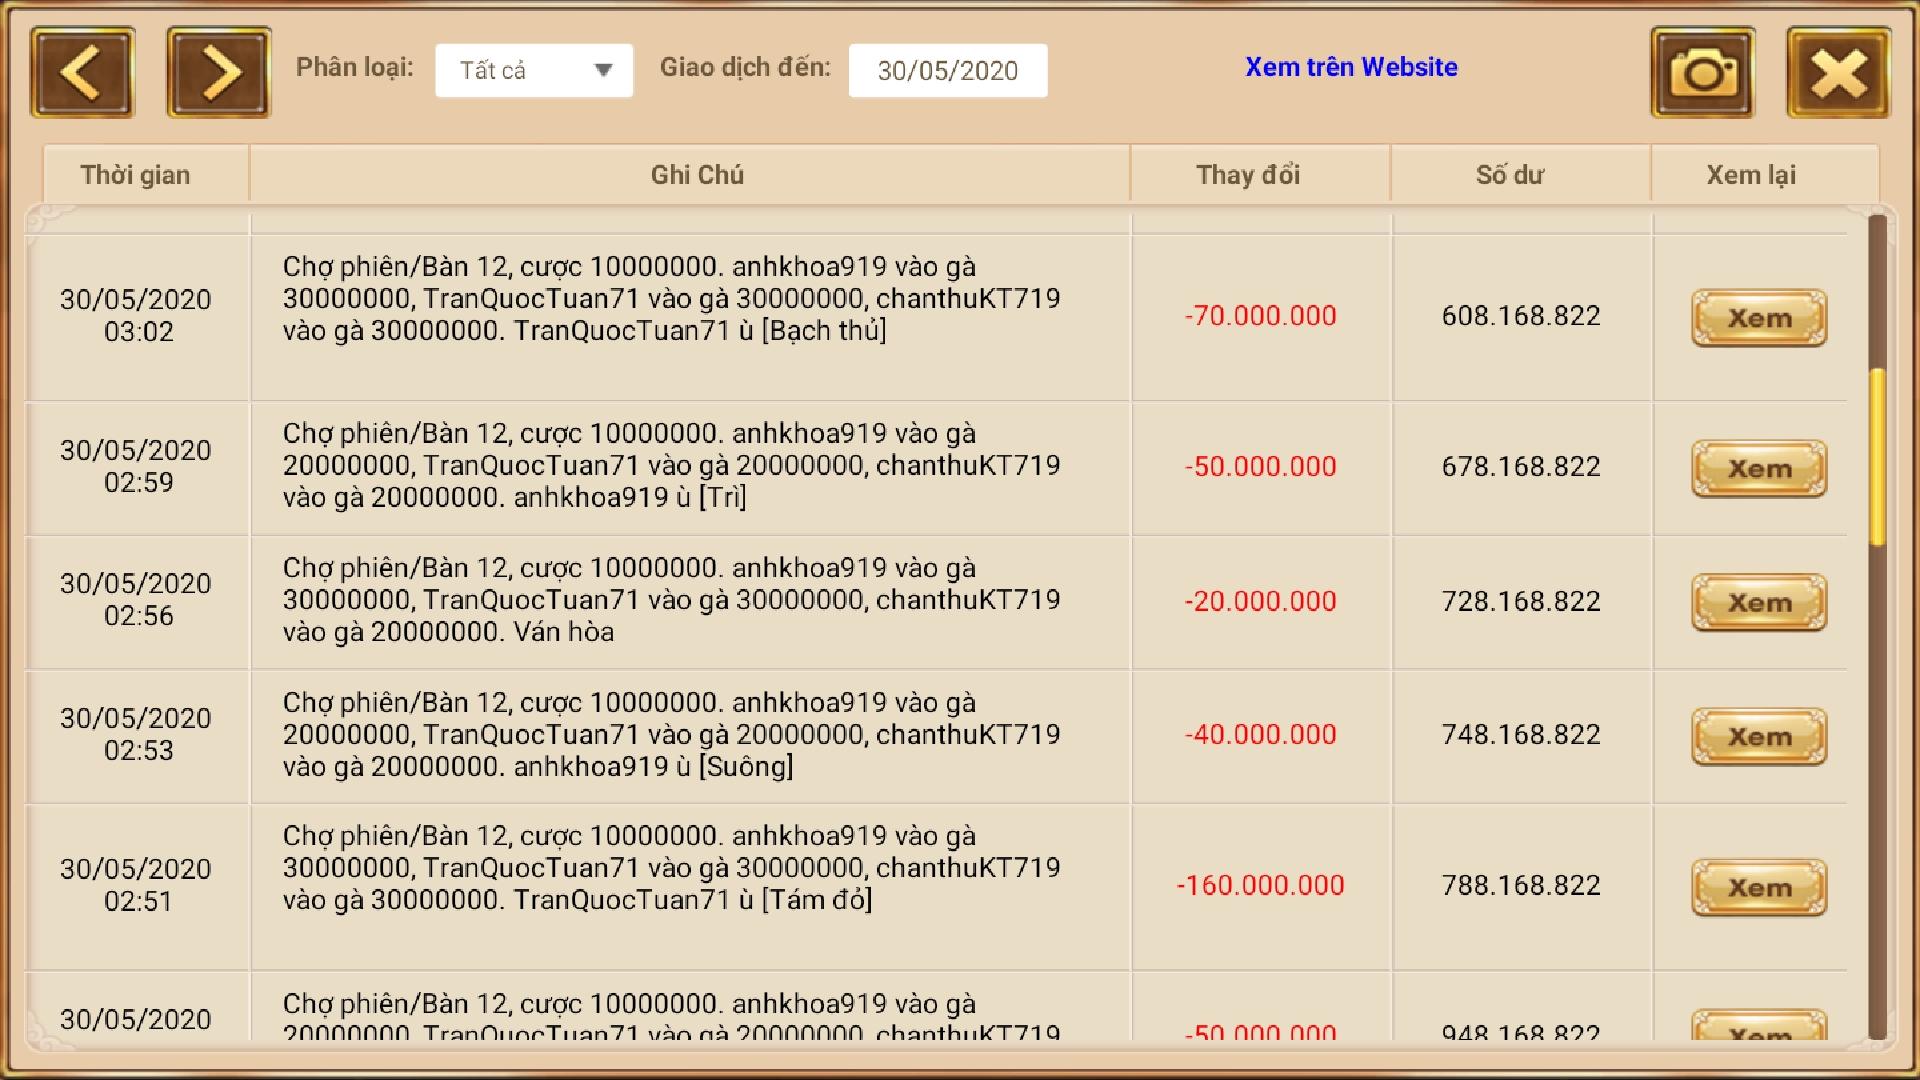 Screenshot_20200604-105541_Chn Sn nh.